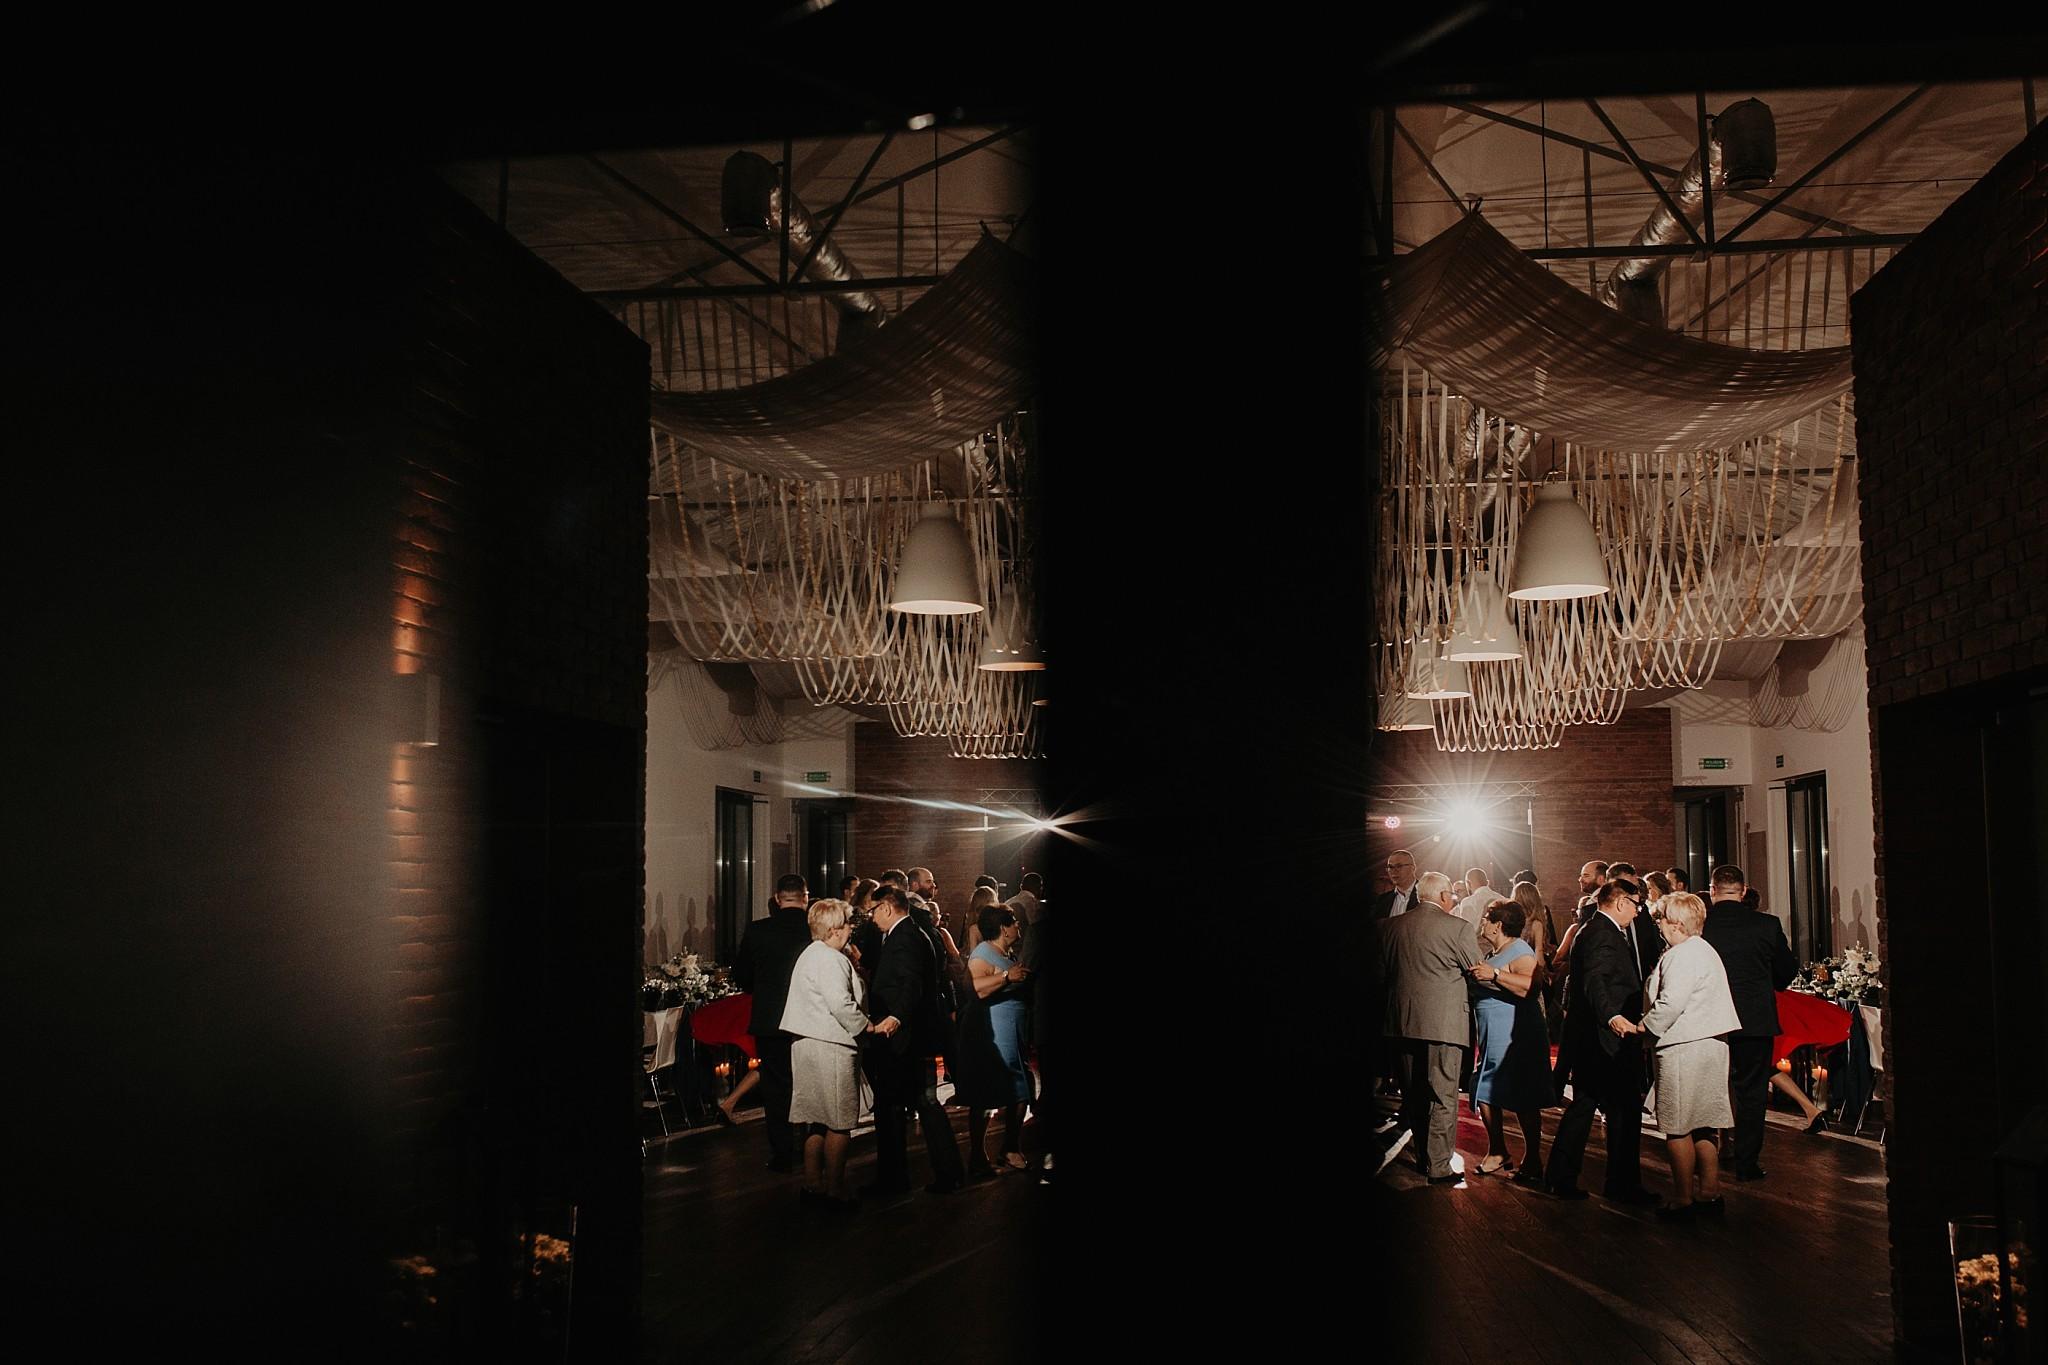 fotograf poznan wesele dobra truskawka piekne wesele pod poznaniem wesele w dobrej truskawce piekna para mloda slub marzen slub koronawirus slub listopad wesele koronawirus 422